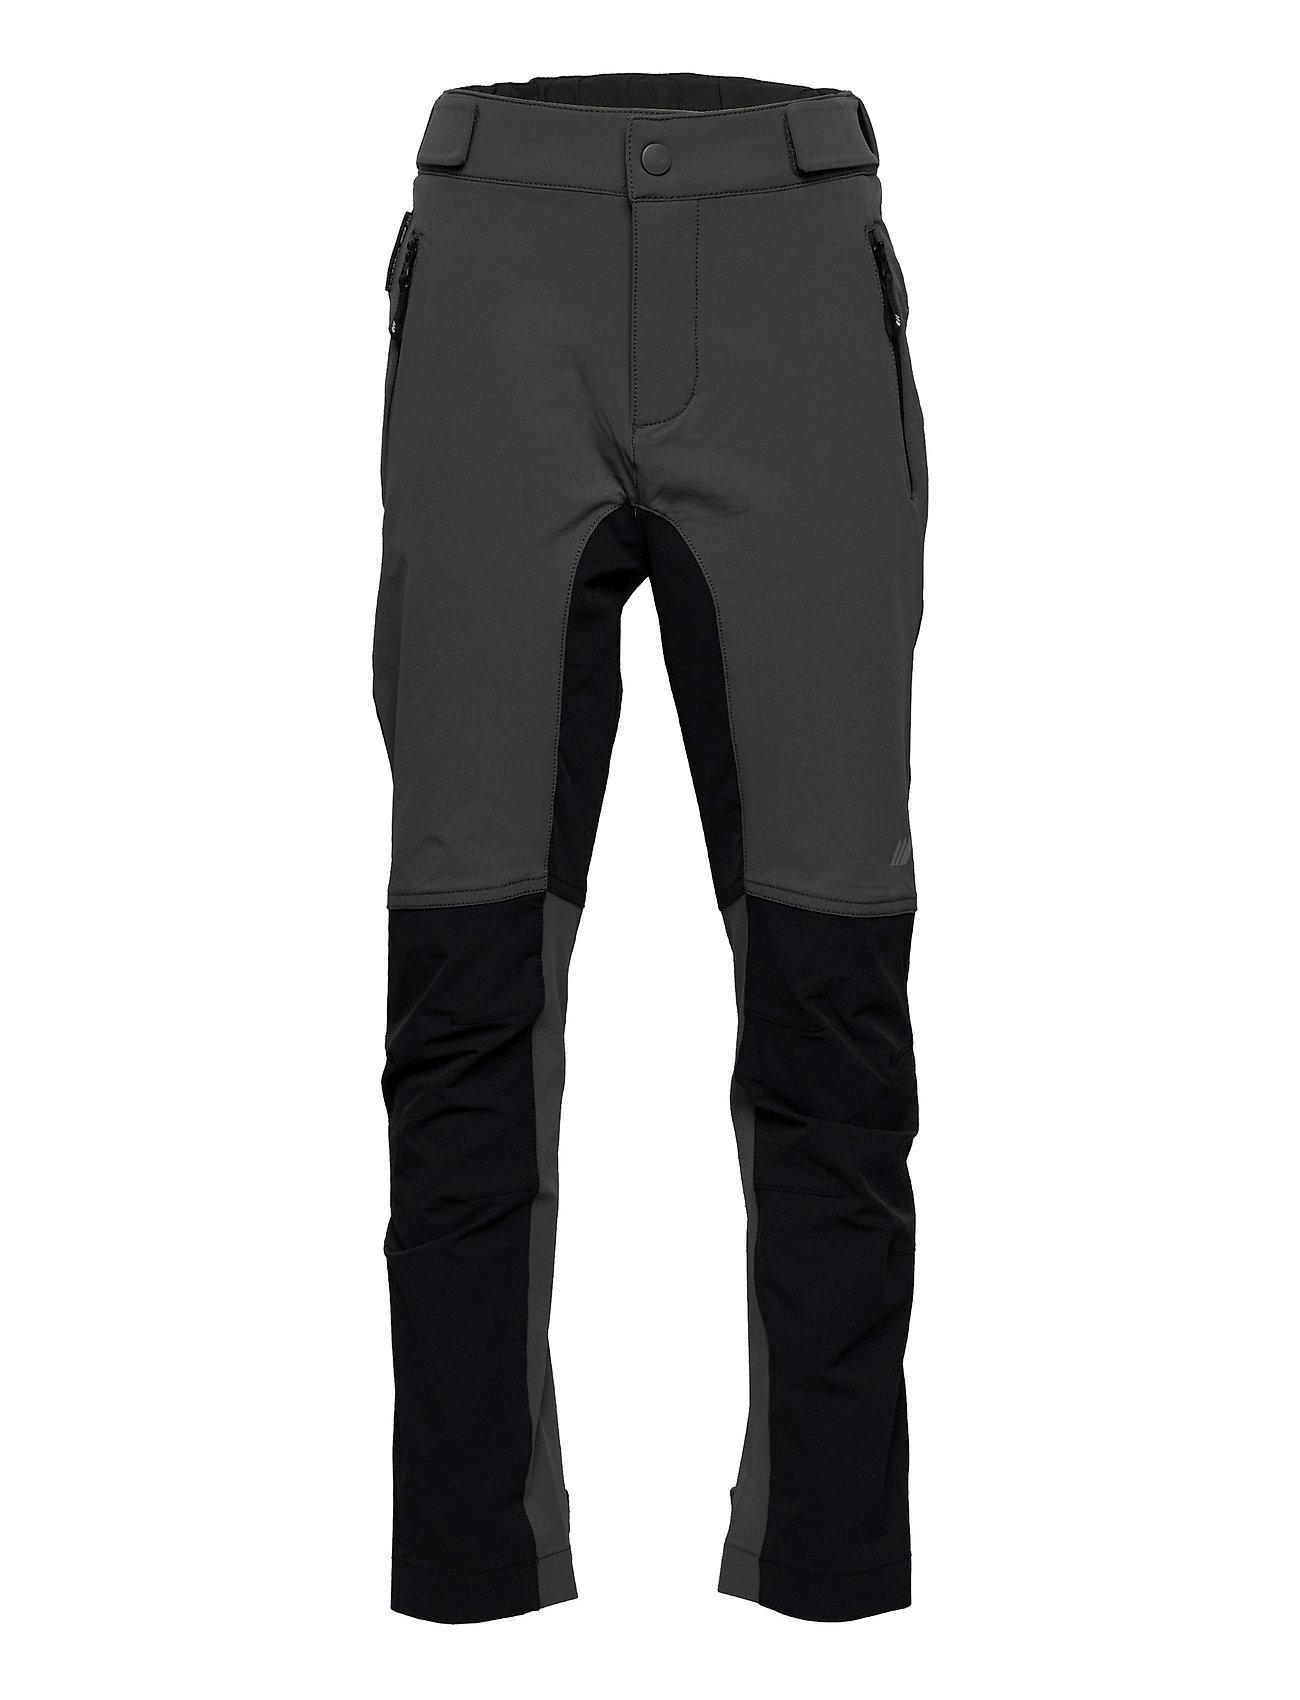 Tinden Hiking Trousers Outerwear Softshells Softshell Trousers Grå Skogstad